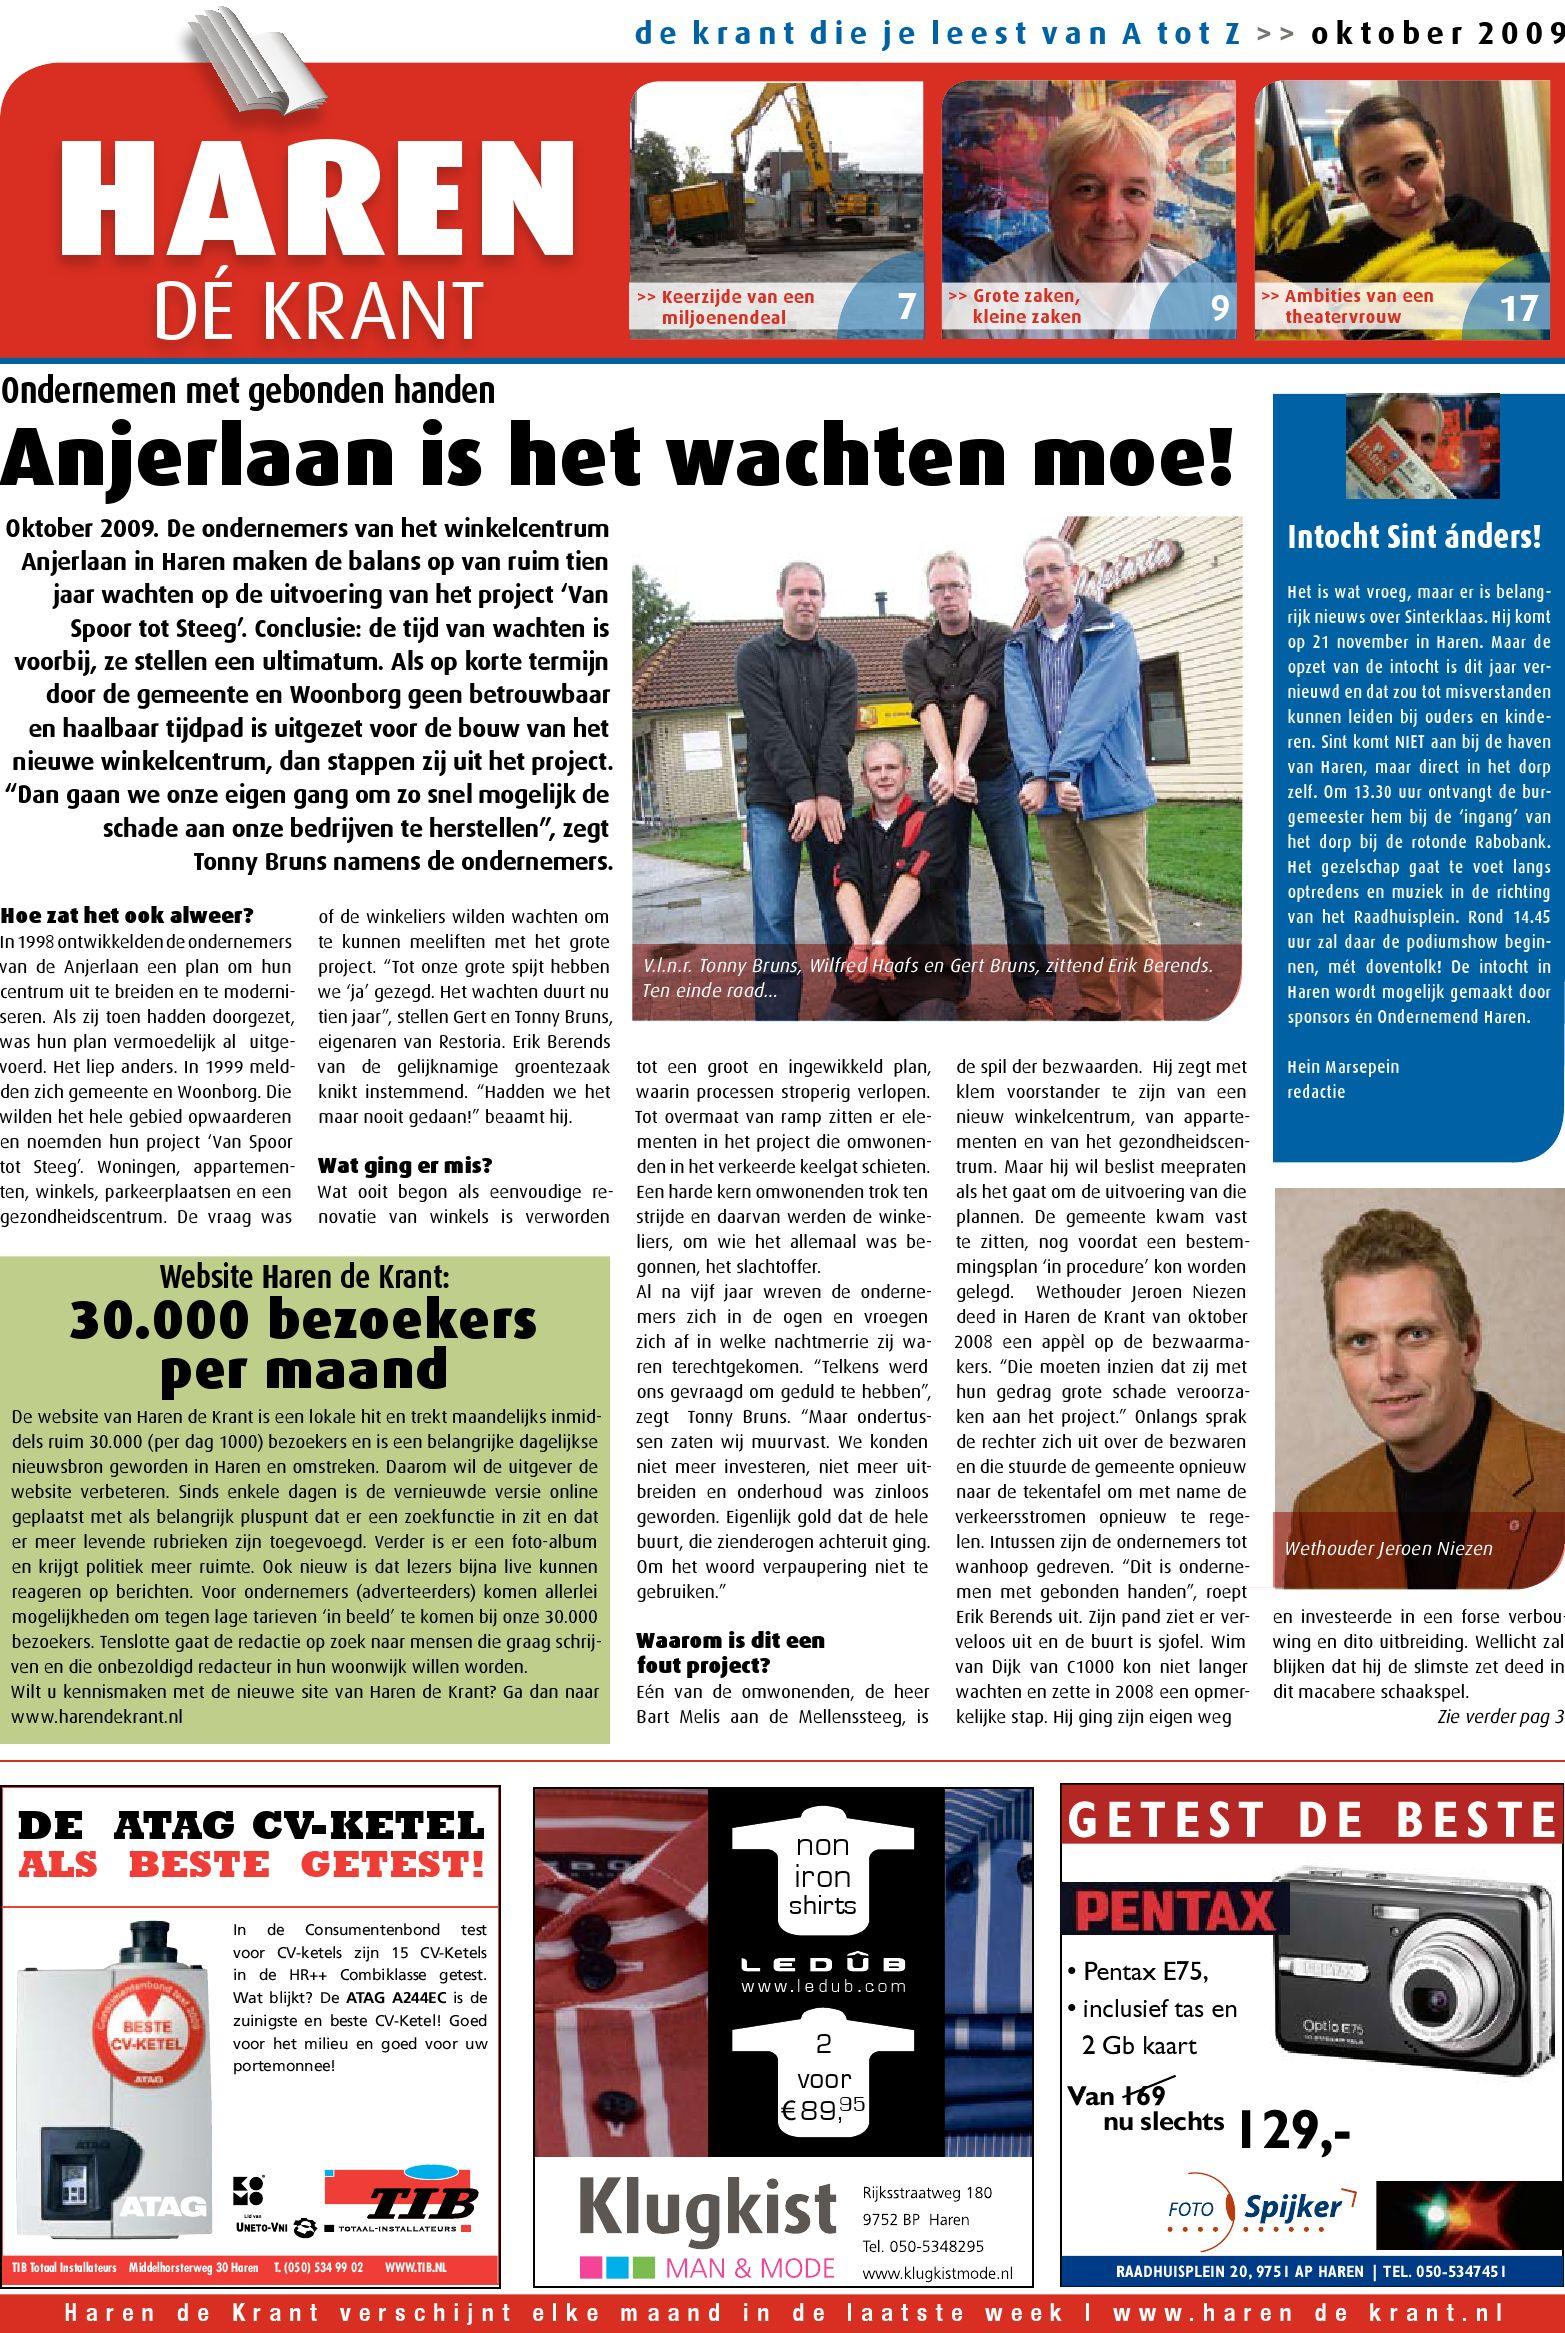 63cd7abe561 Haren de Krant oktober 2009 by Haren de Krant - issuu